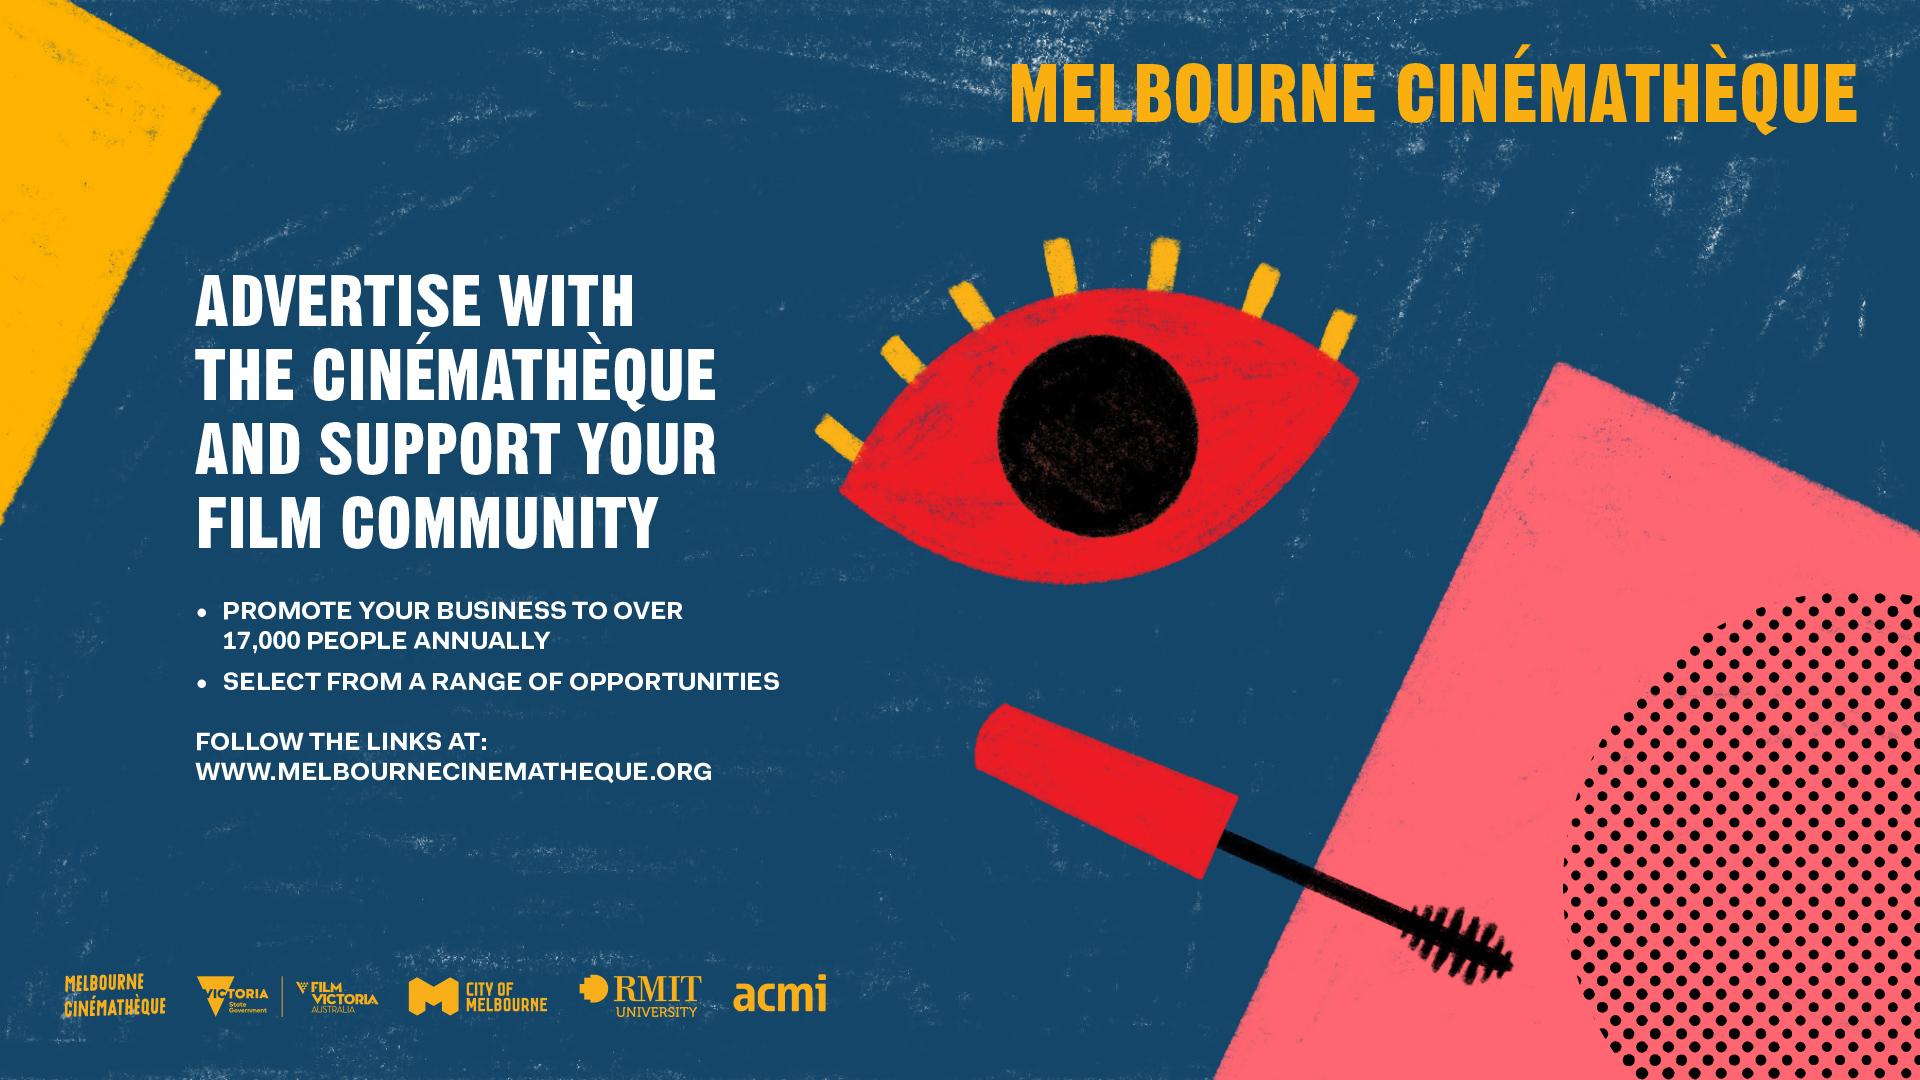 cinematheque-2019-slides-FA-advertise - Copy.jpg